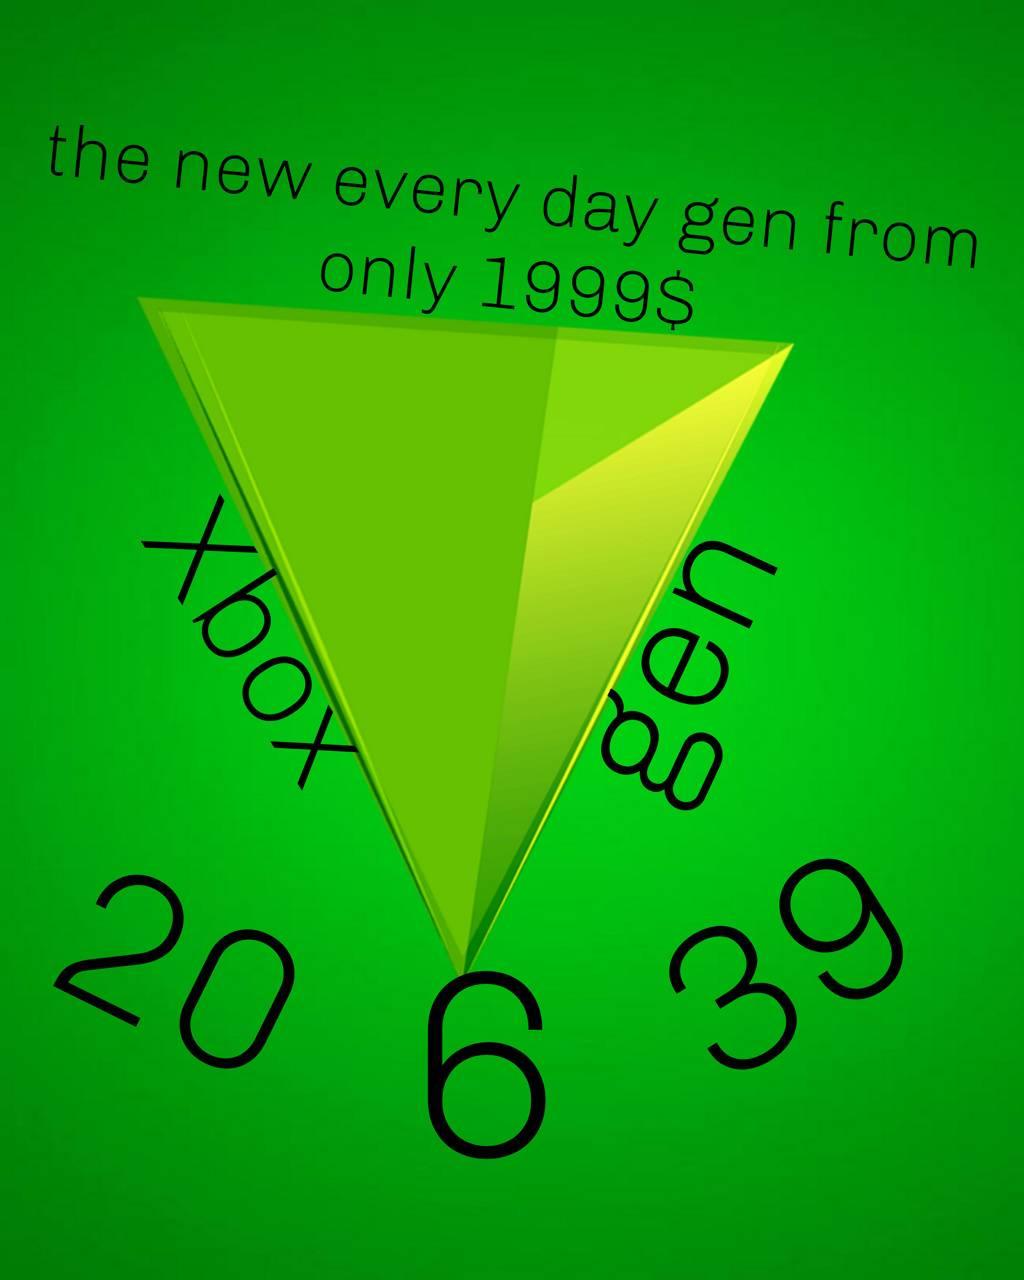 Xbox gen 6